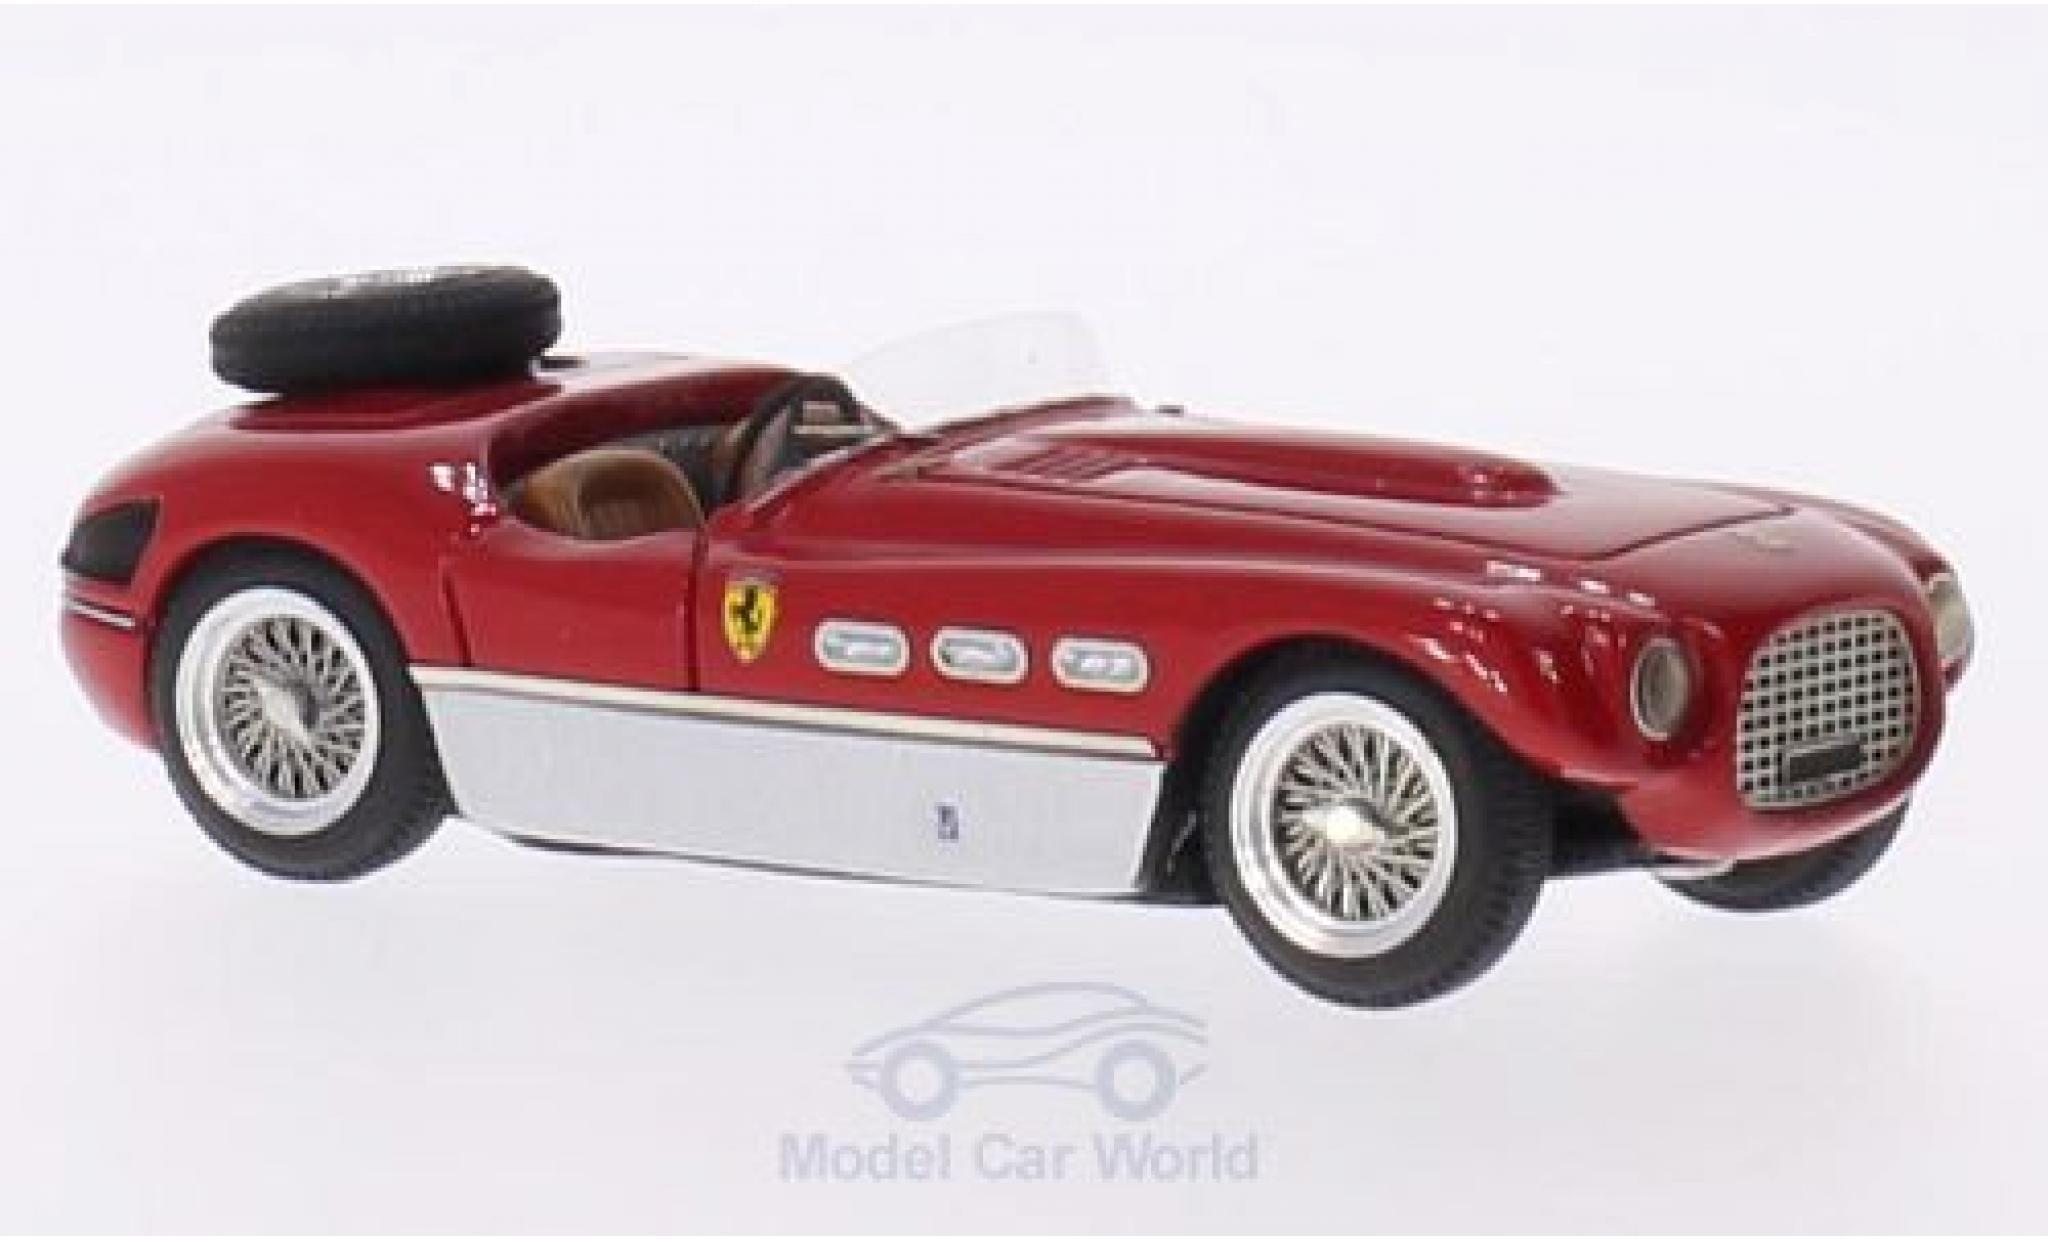 Ferrari 340 1/43 Jolly Model Spyder Vignale rot/silber RHD 1953